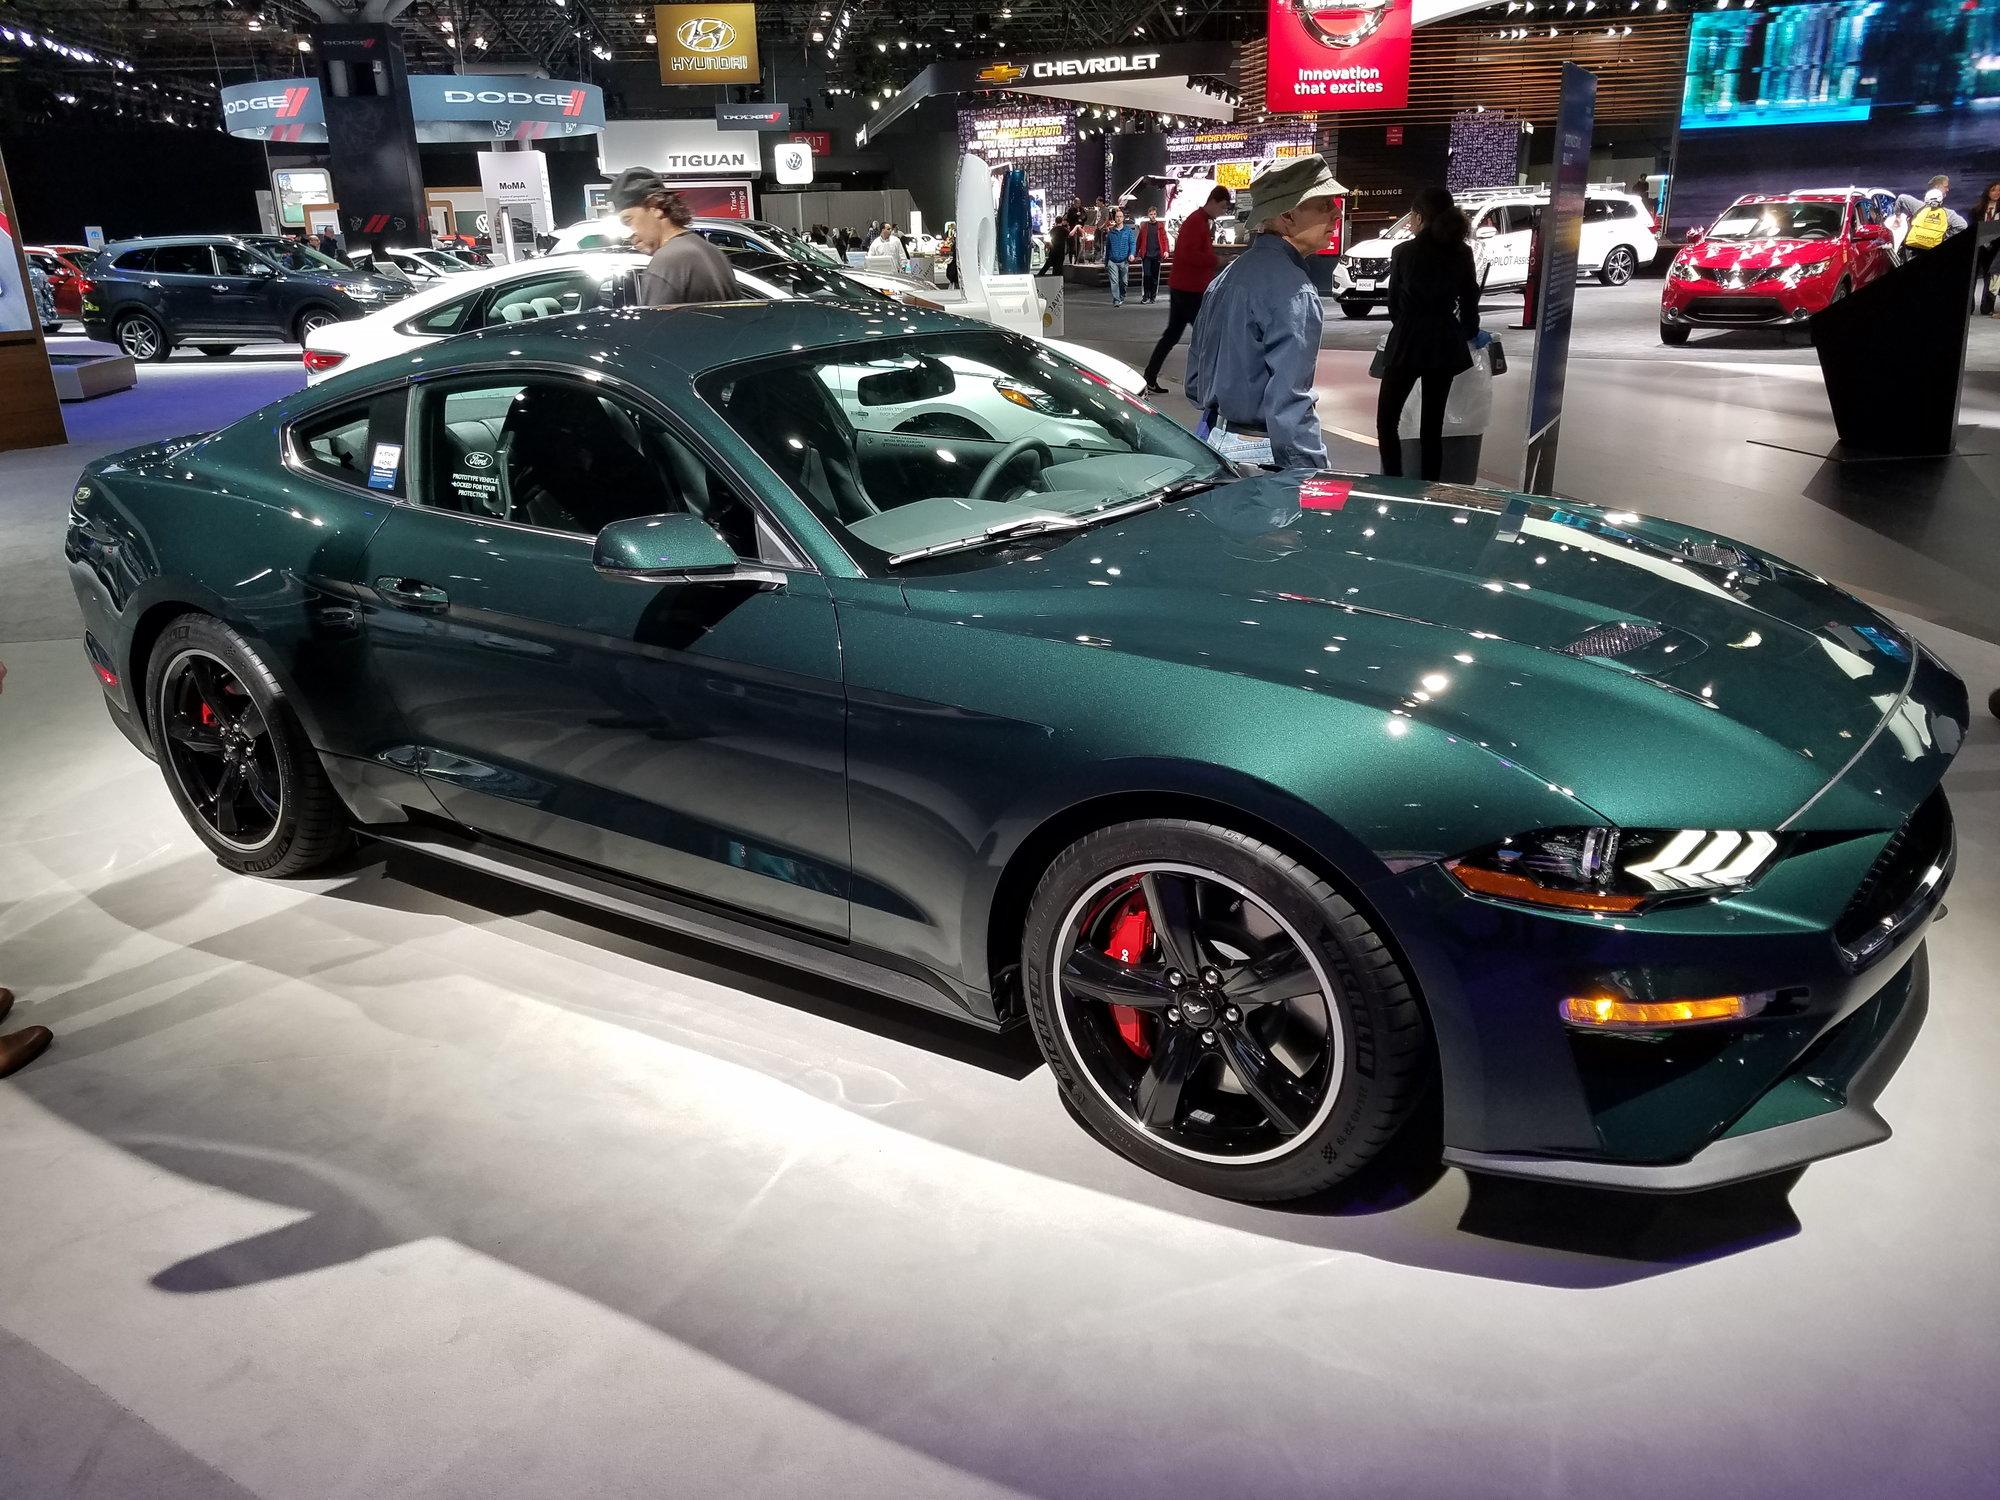 New York International Auto Show Report Rennlist Porsche - Auto show near me